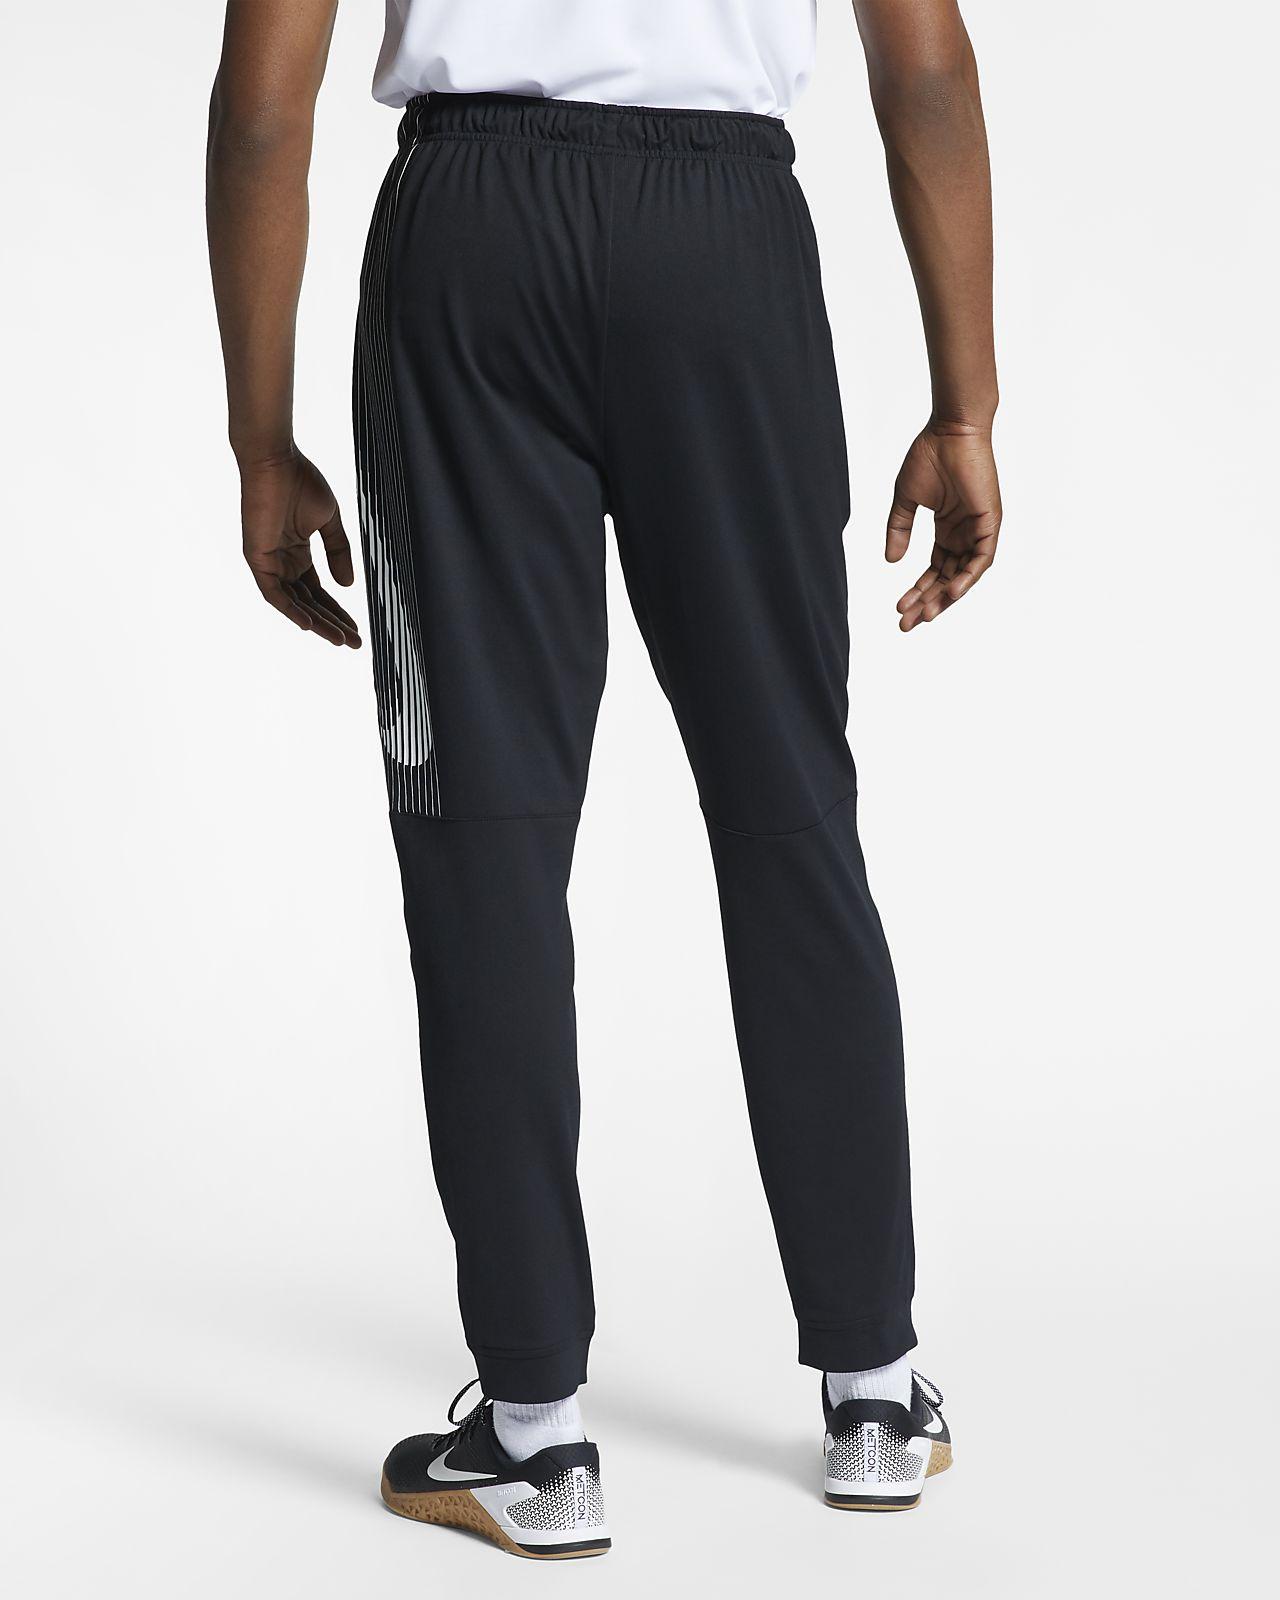 timeless design 64aa8 b7df9 ... Pantalon de training Nike Dri-FIT pour Homme